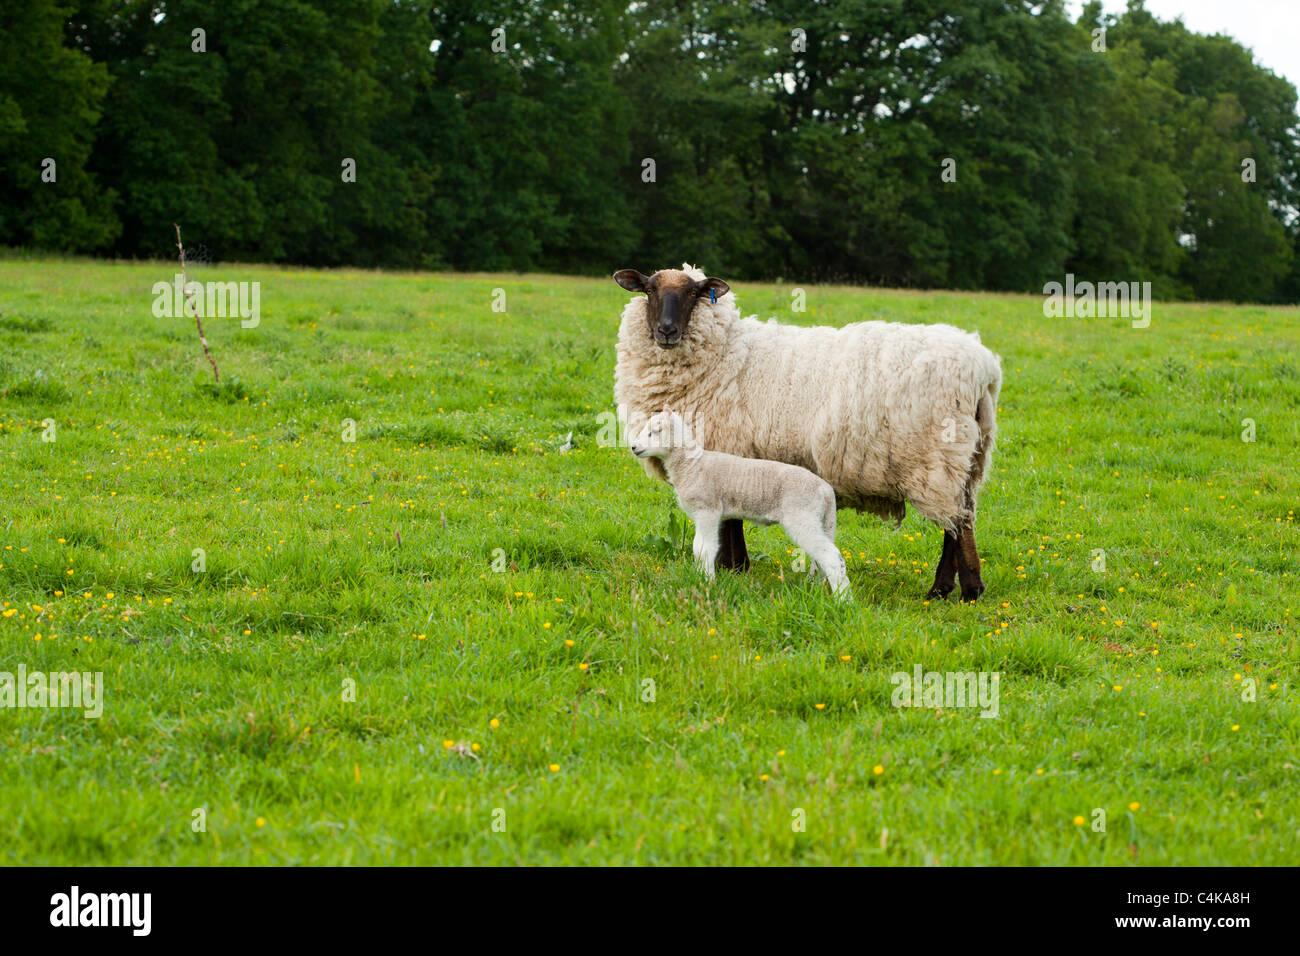 Ewe sheep and her young lamb - Stock Image